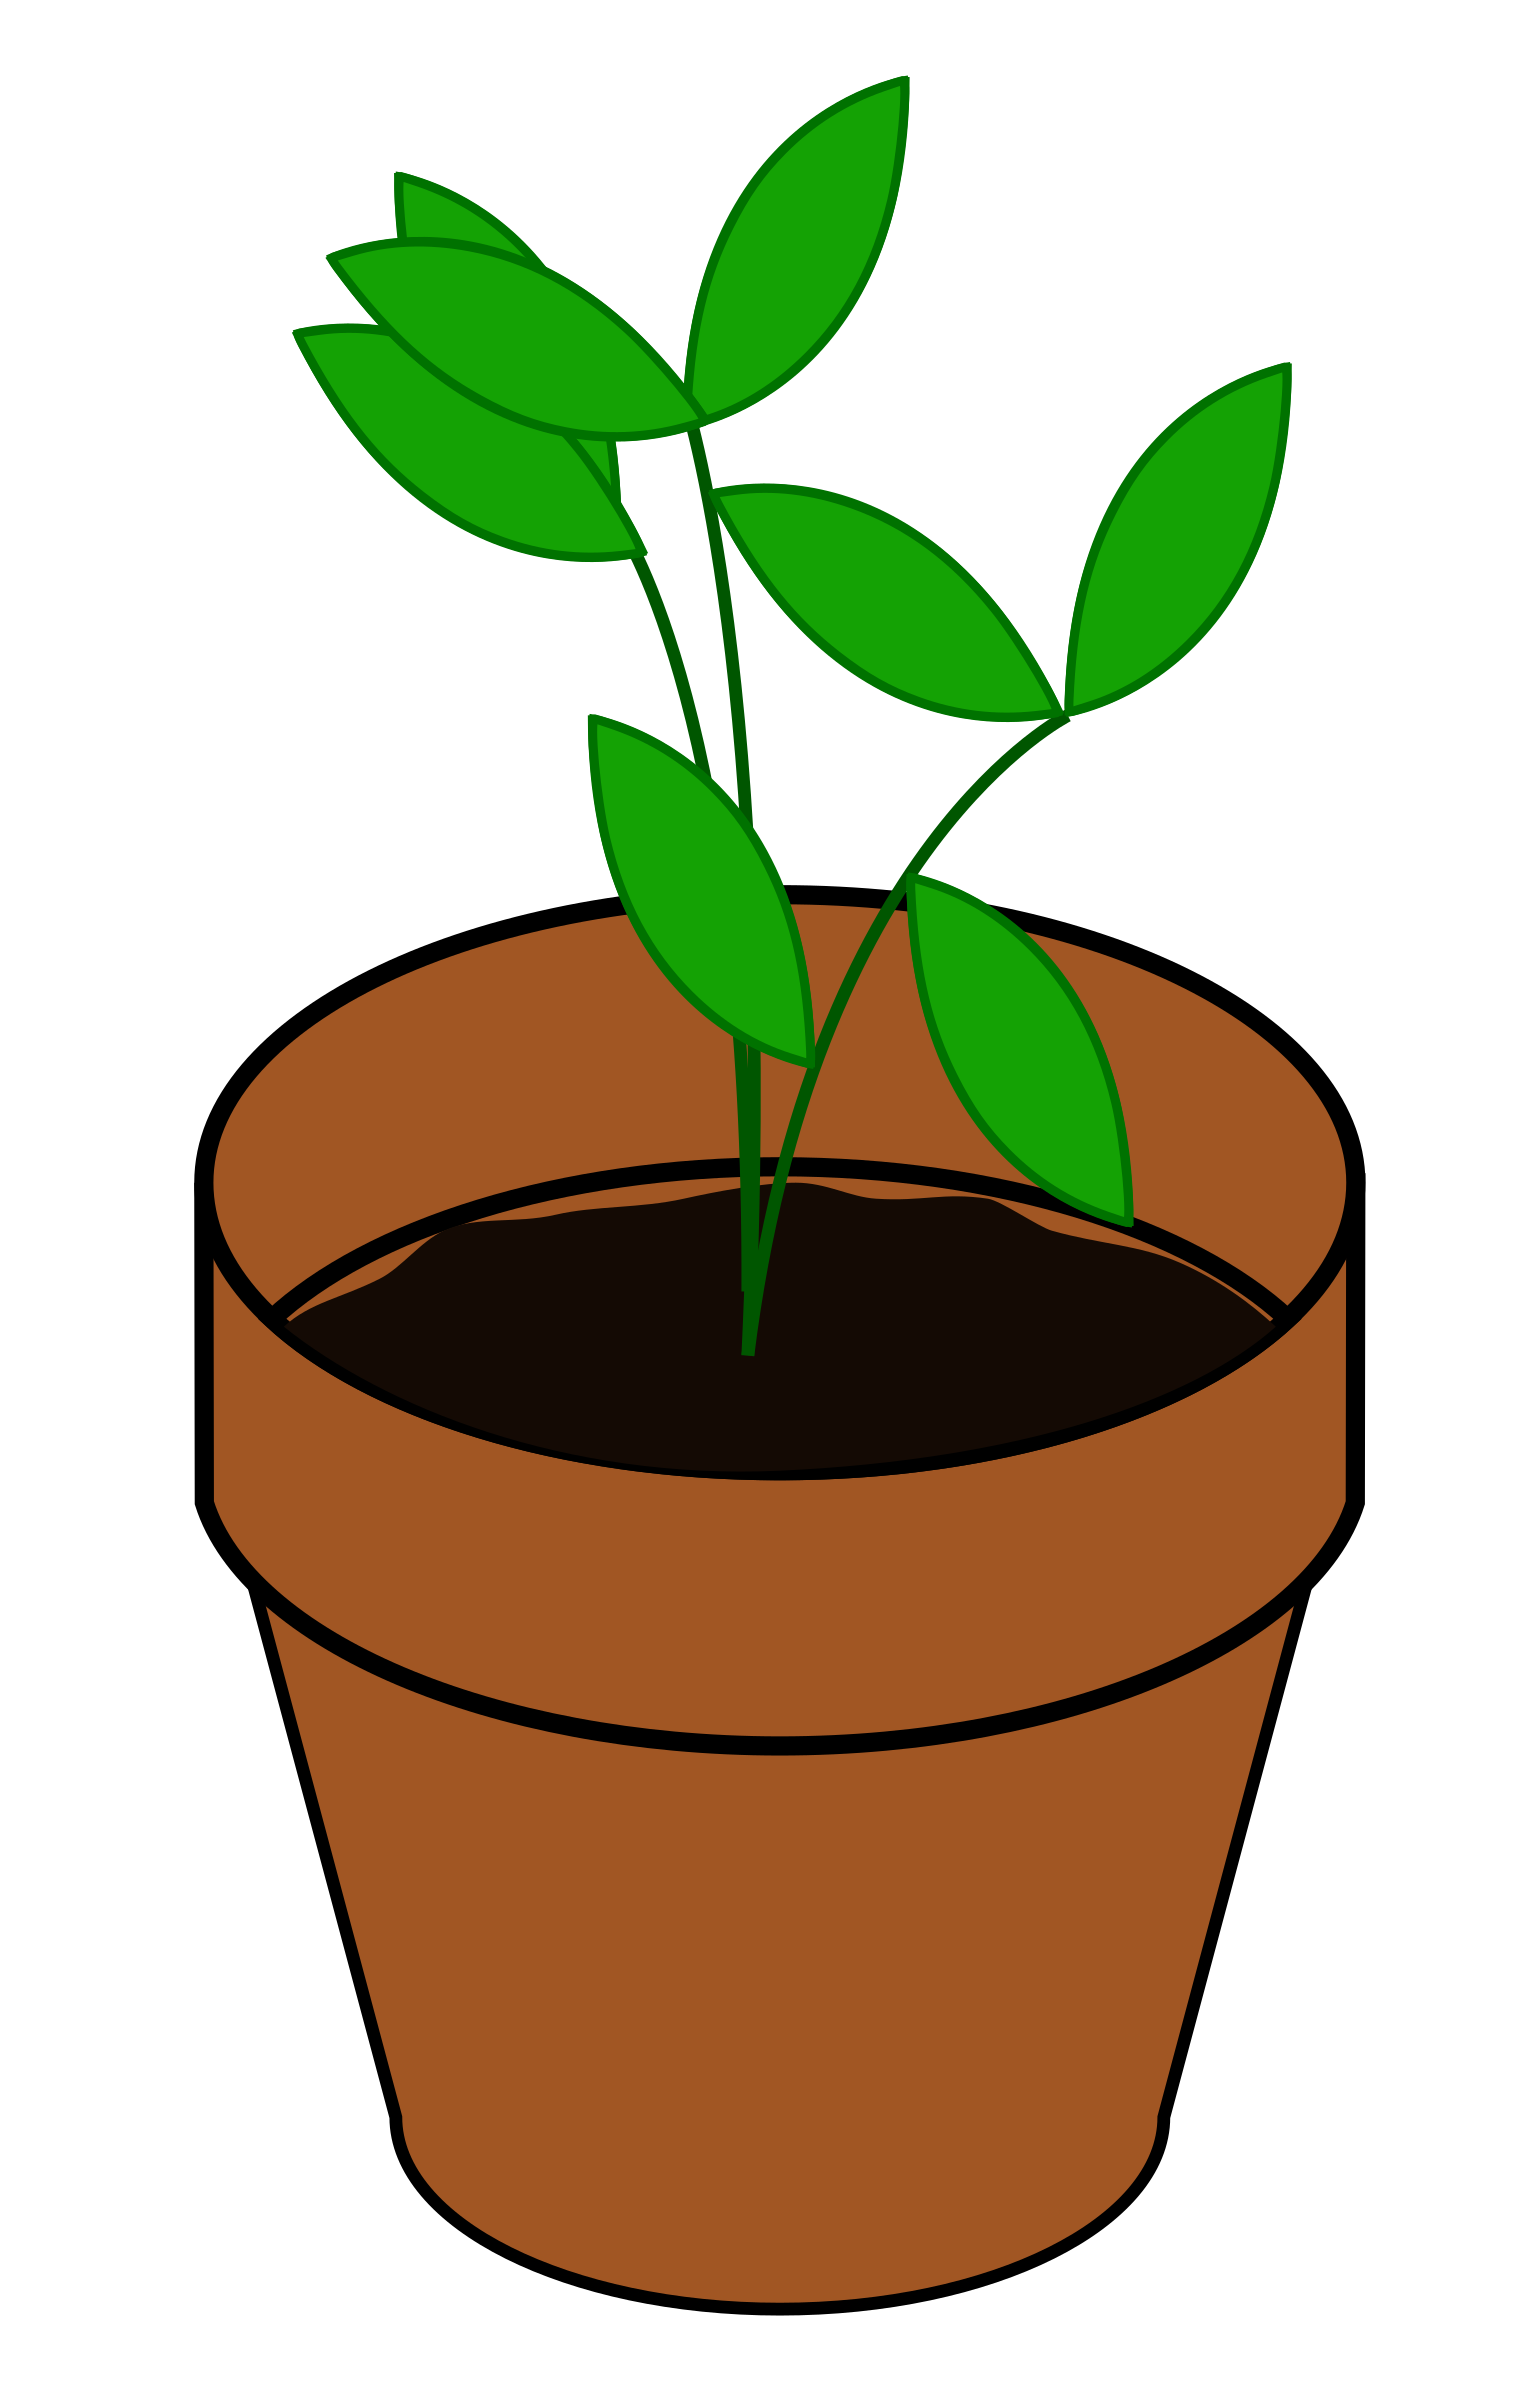 Planting clipart sad. Plant terracotta big image